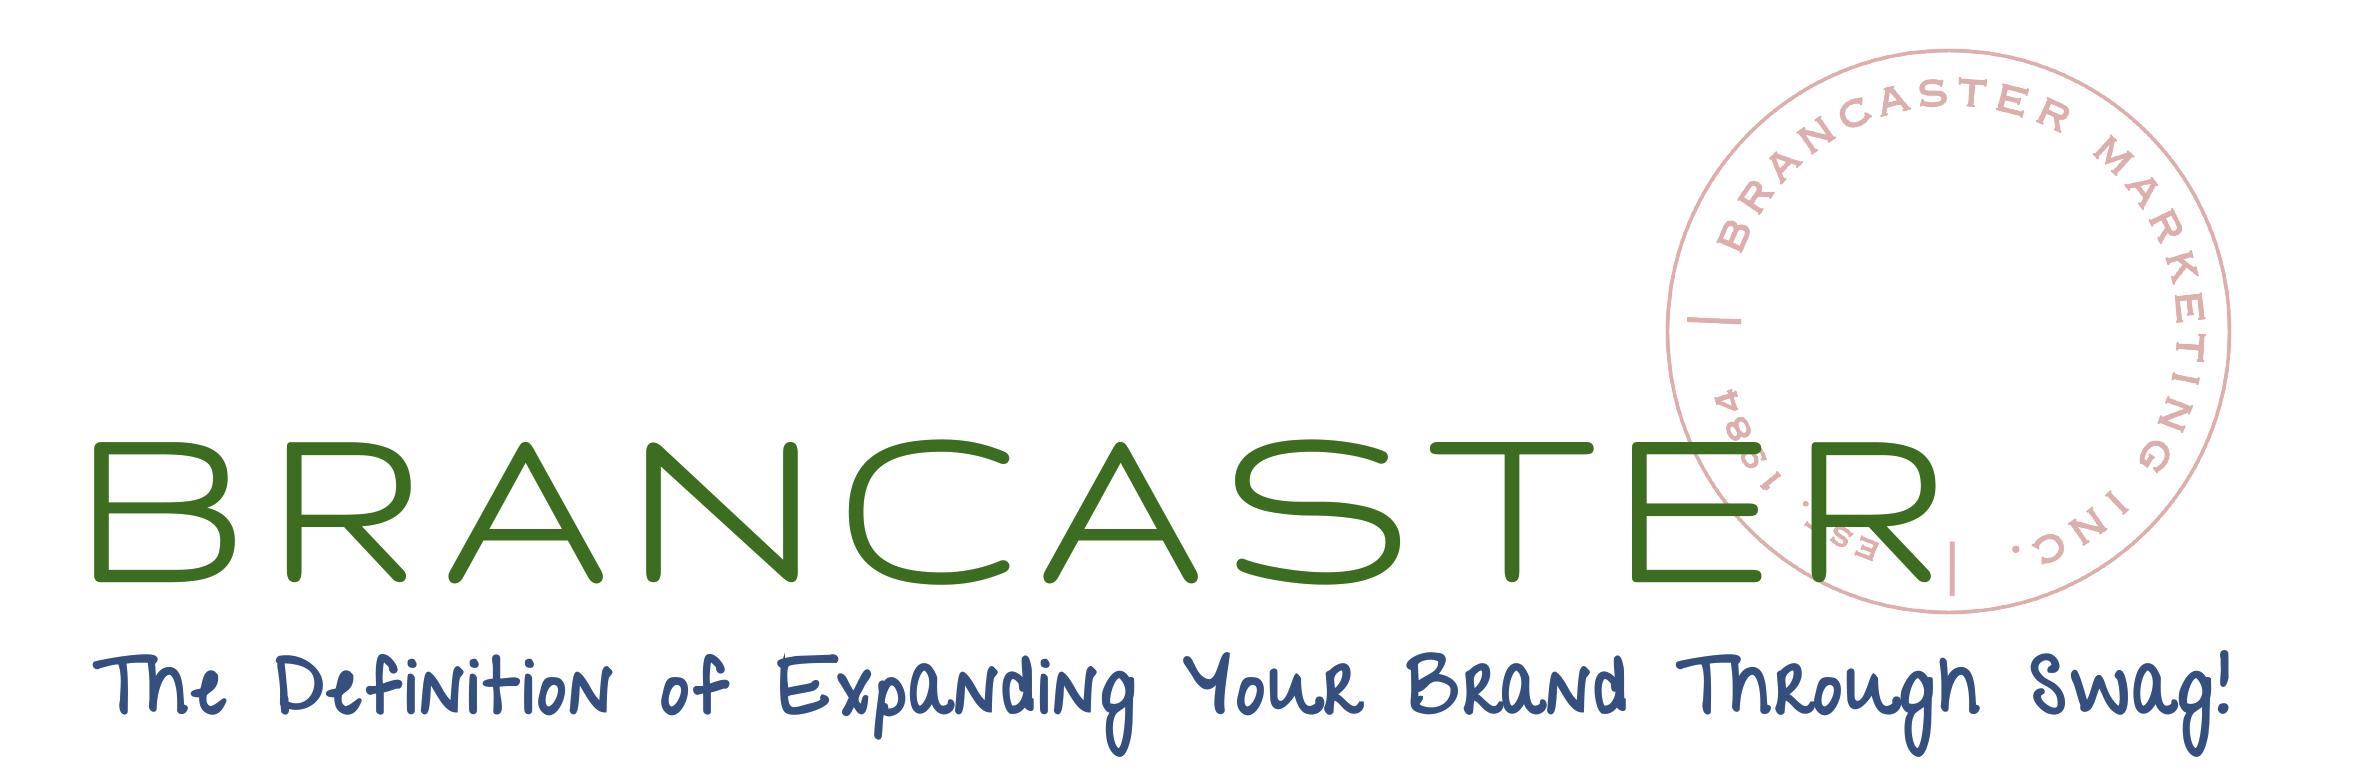 Brancaster Marketing, Inc.